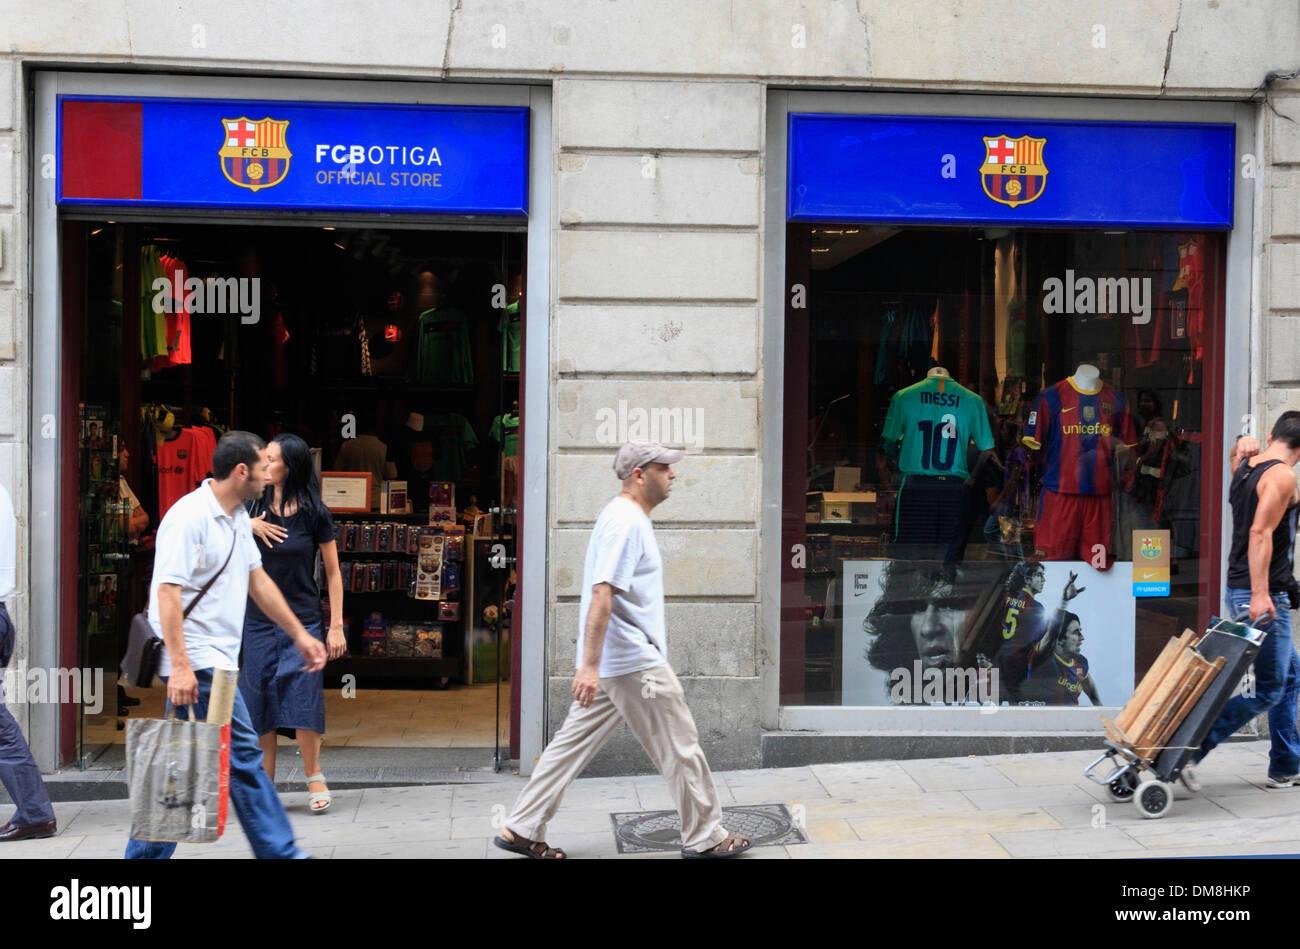 Shop of FC Barcelona at Ramblas, Barcelona, Spain, Europe - Stock Image